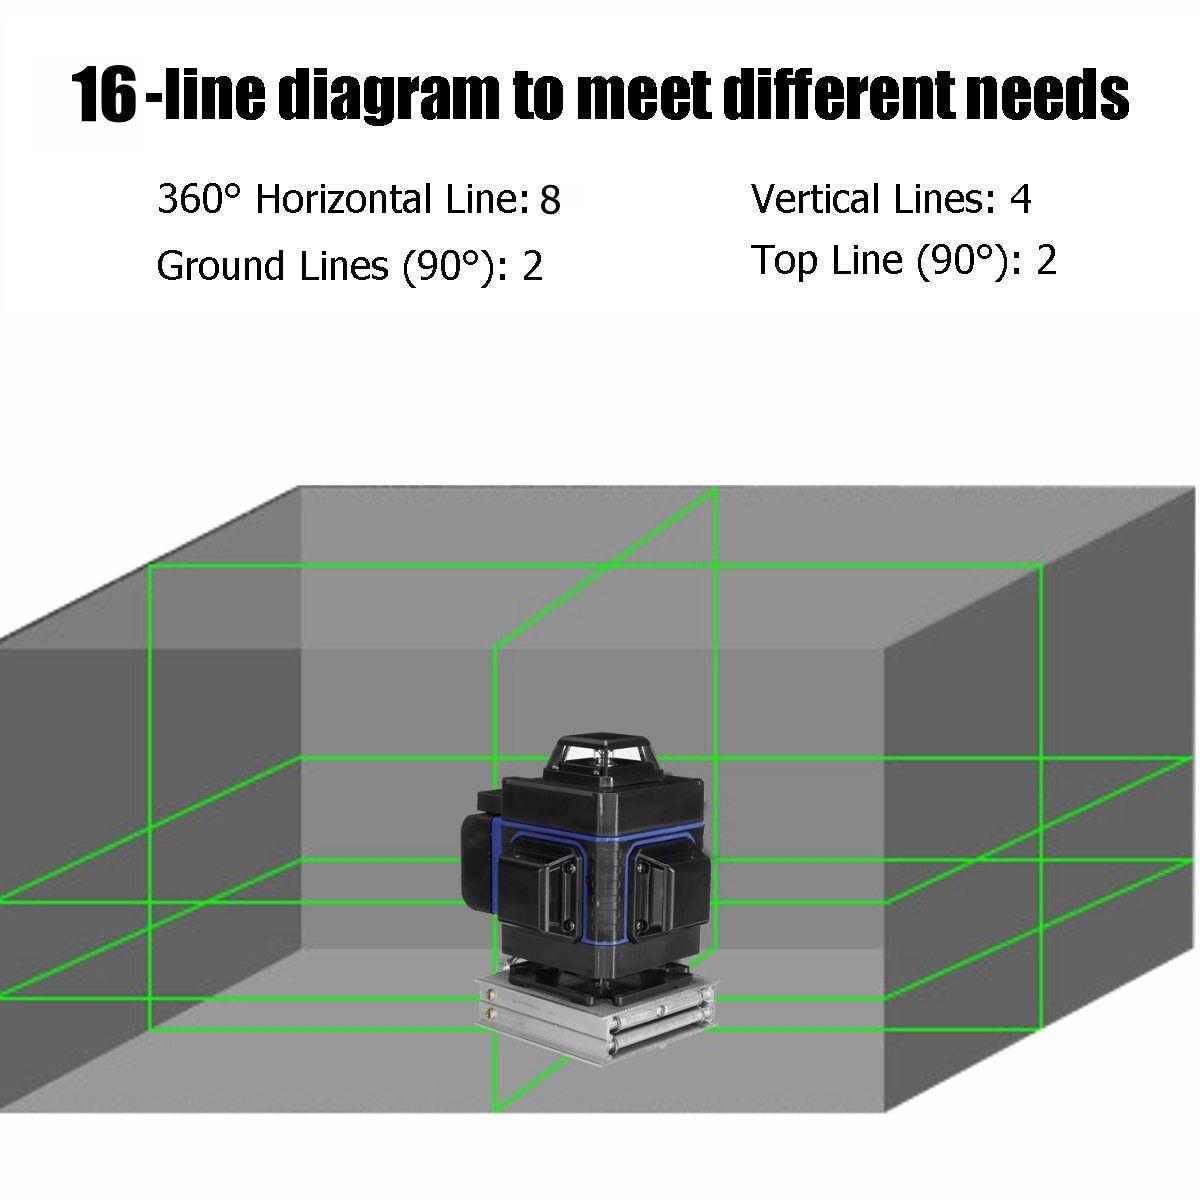 3D Green Beam Laser Level 12/16 in 2020 Laser levels